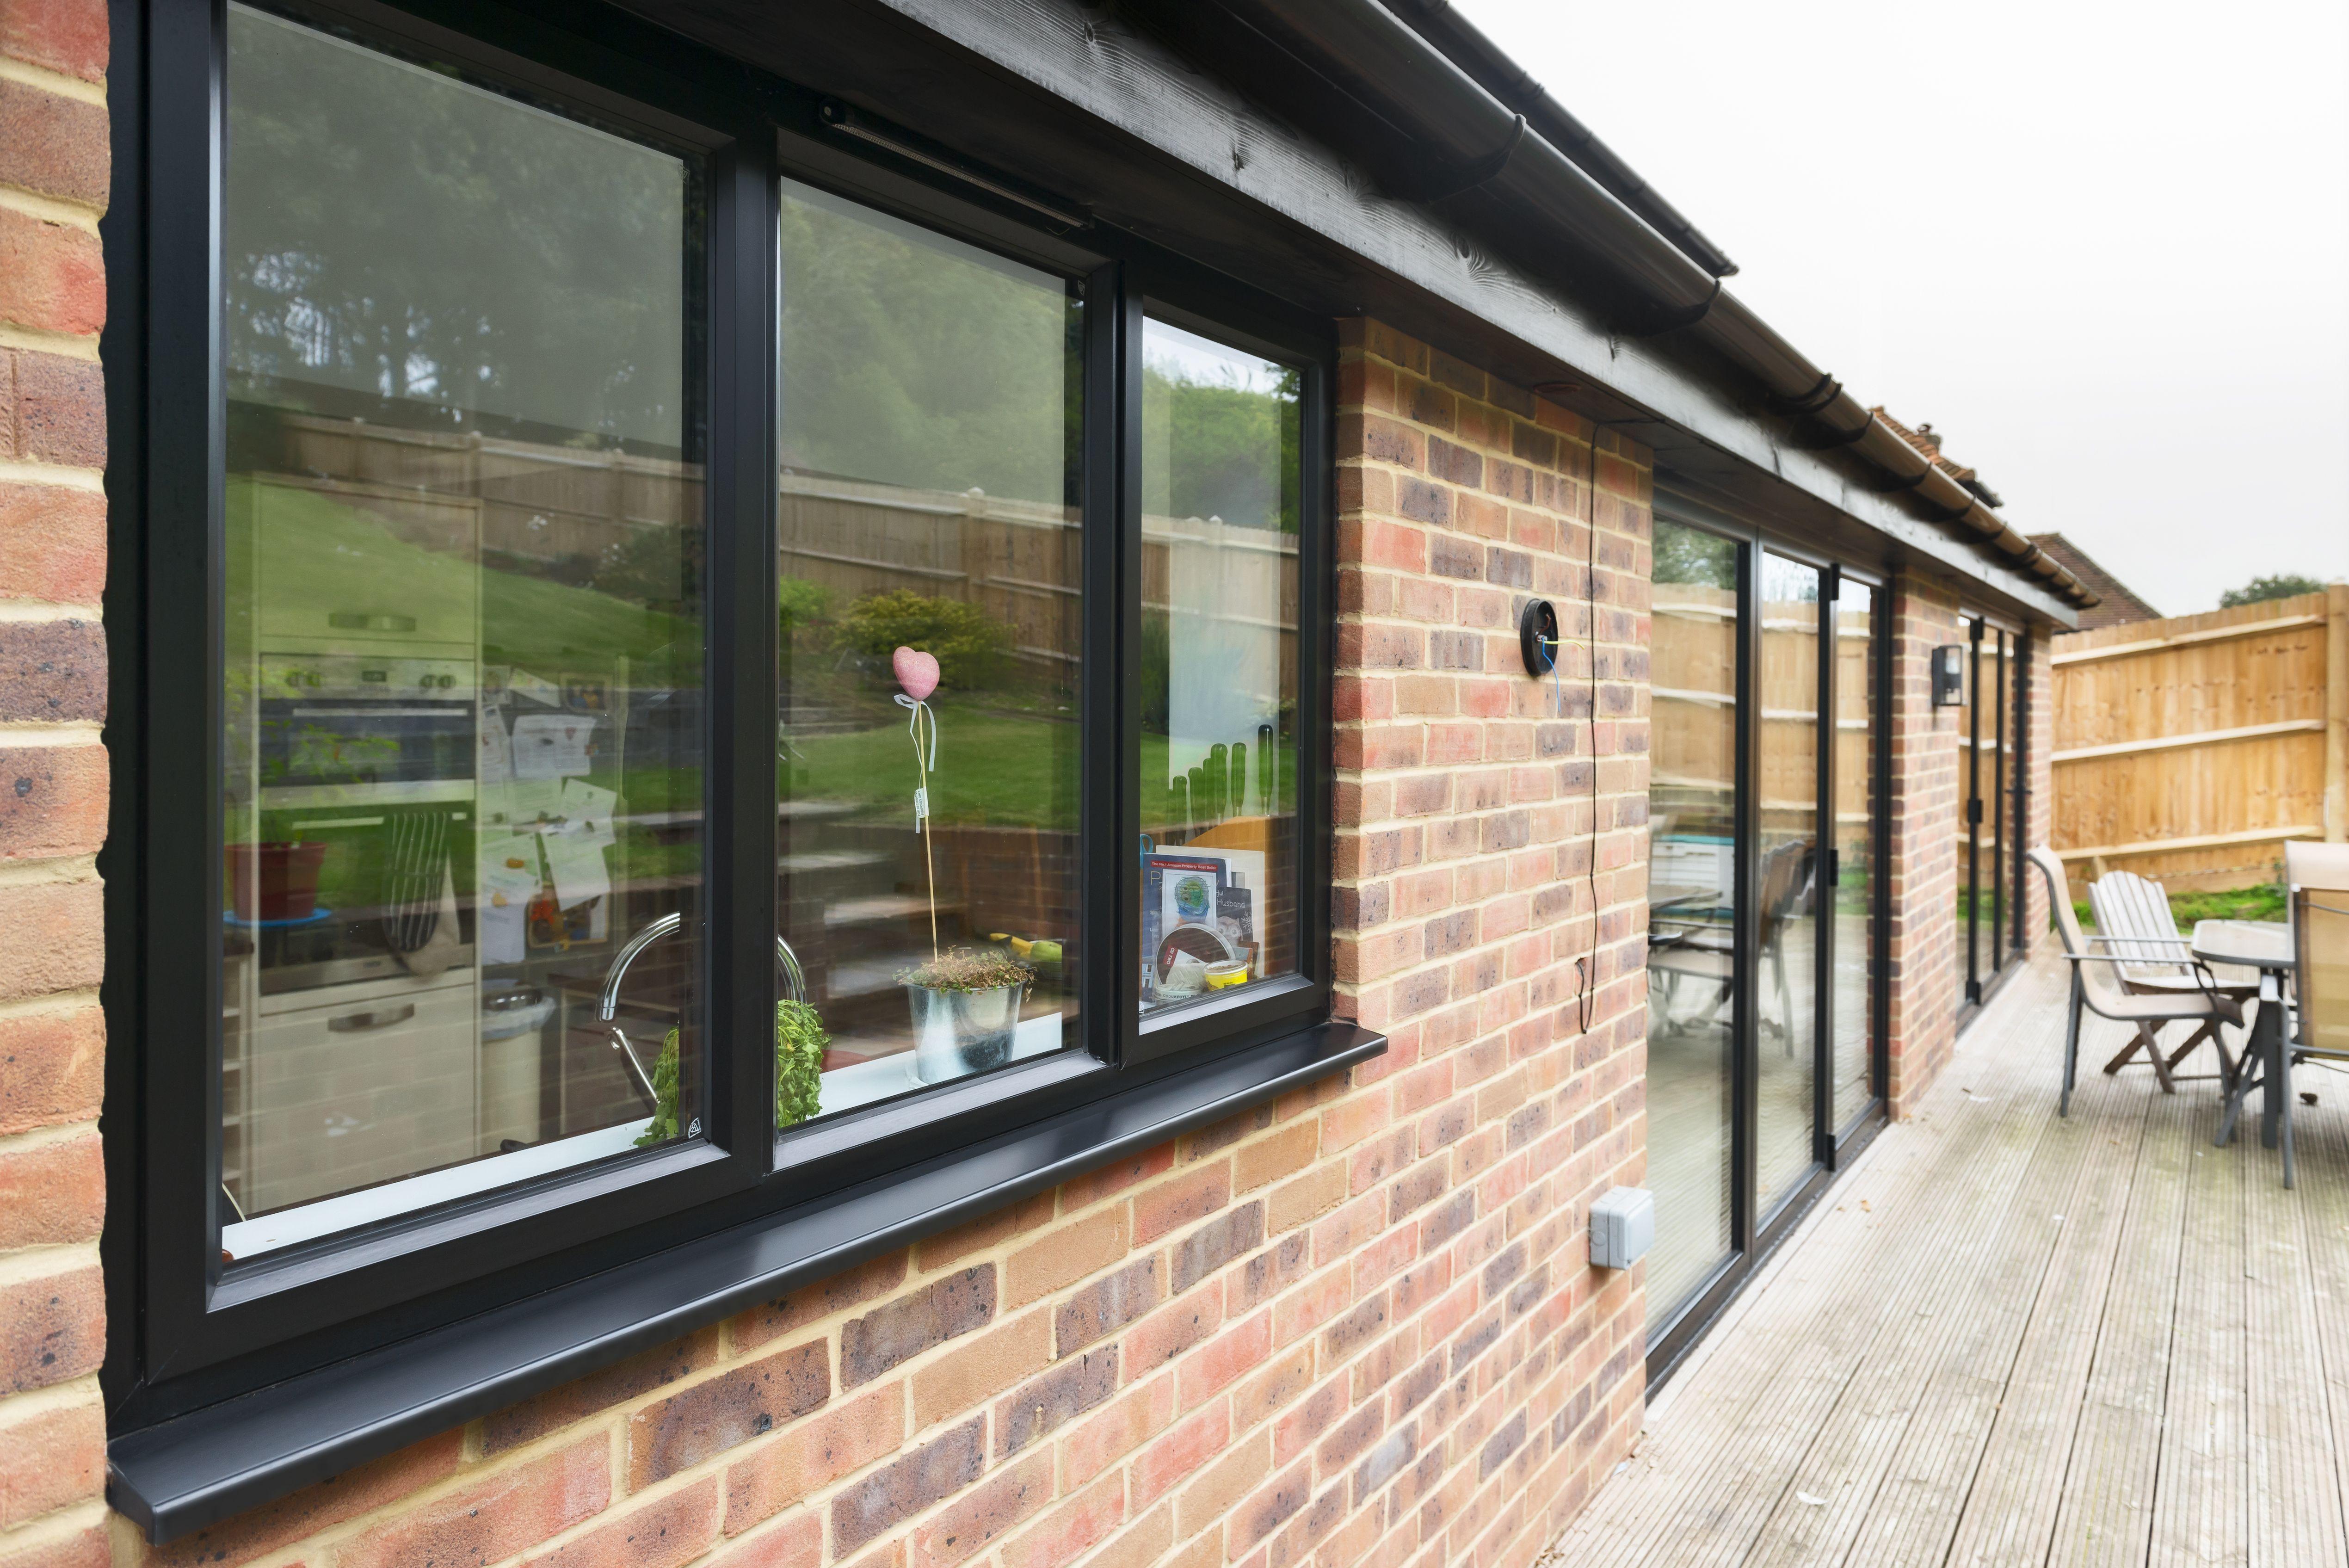 3390 #926539  Doors Elements Of Layout Pinterest Black Windows And Doors And picture/photo Millennium Garage Doors 36195079